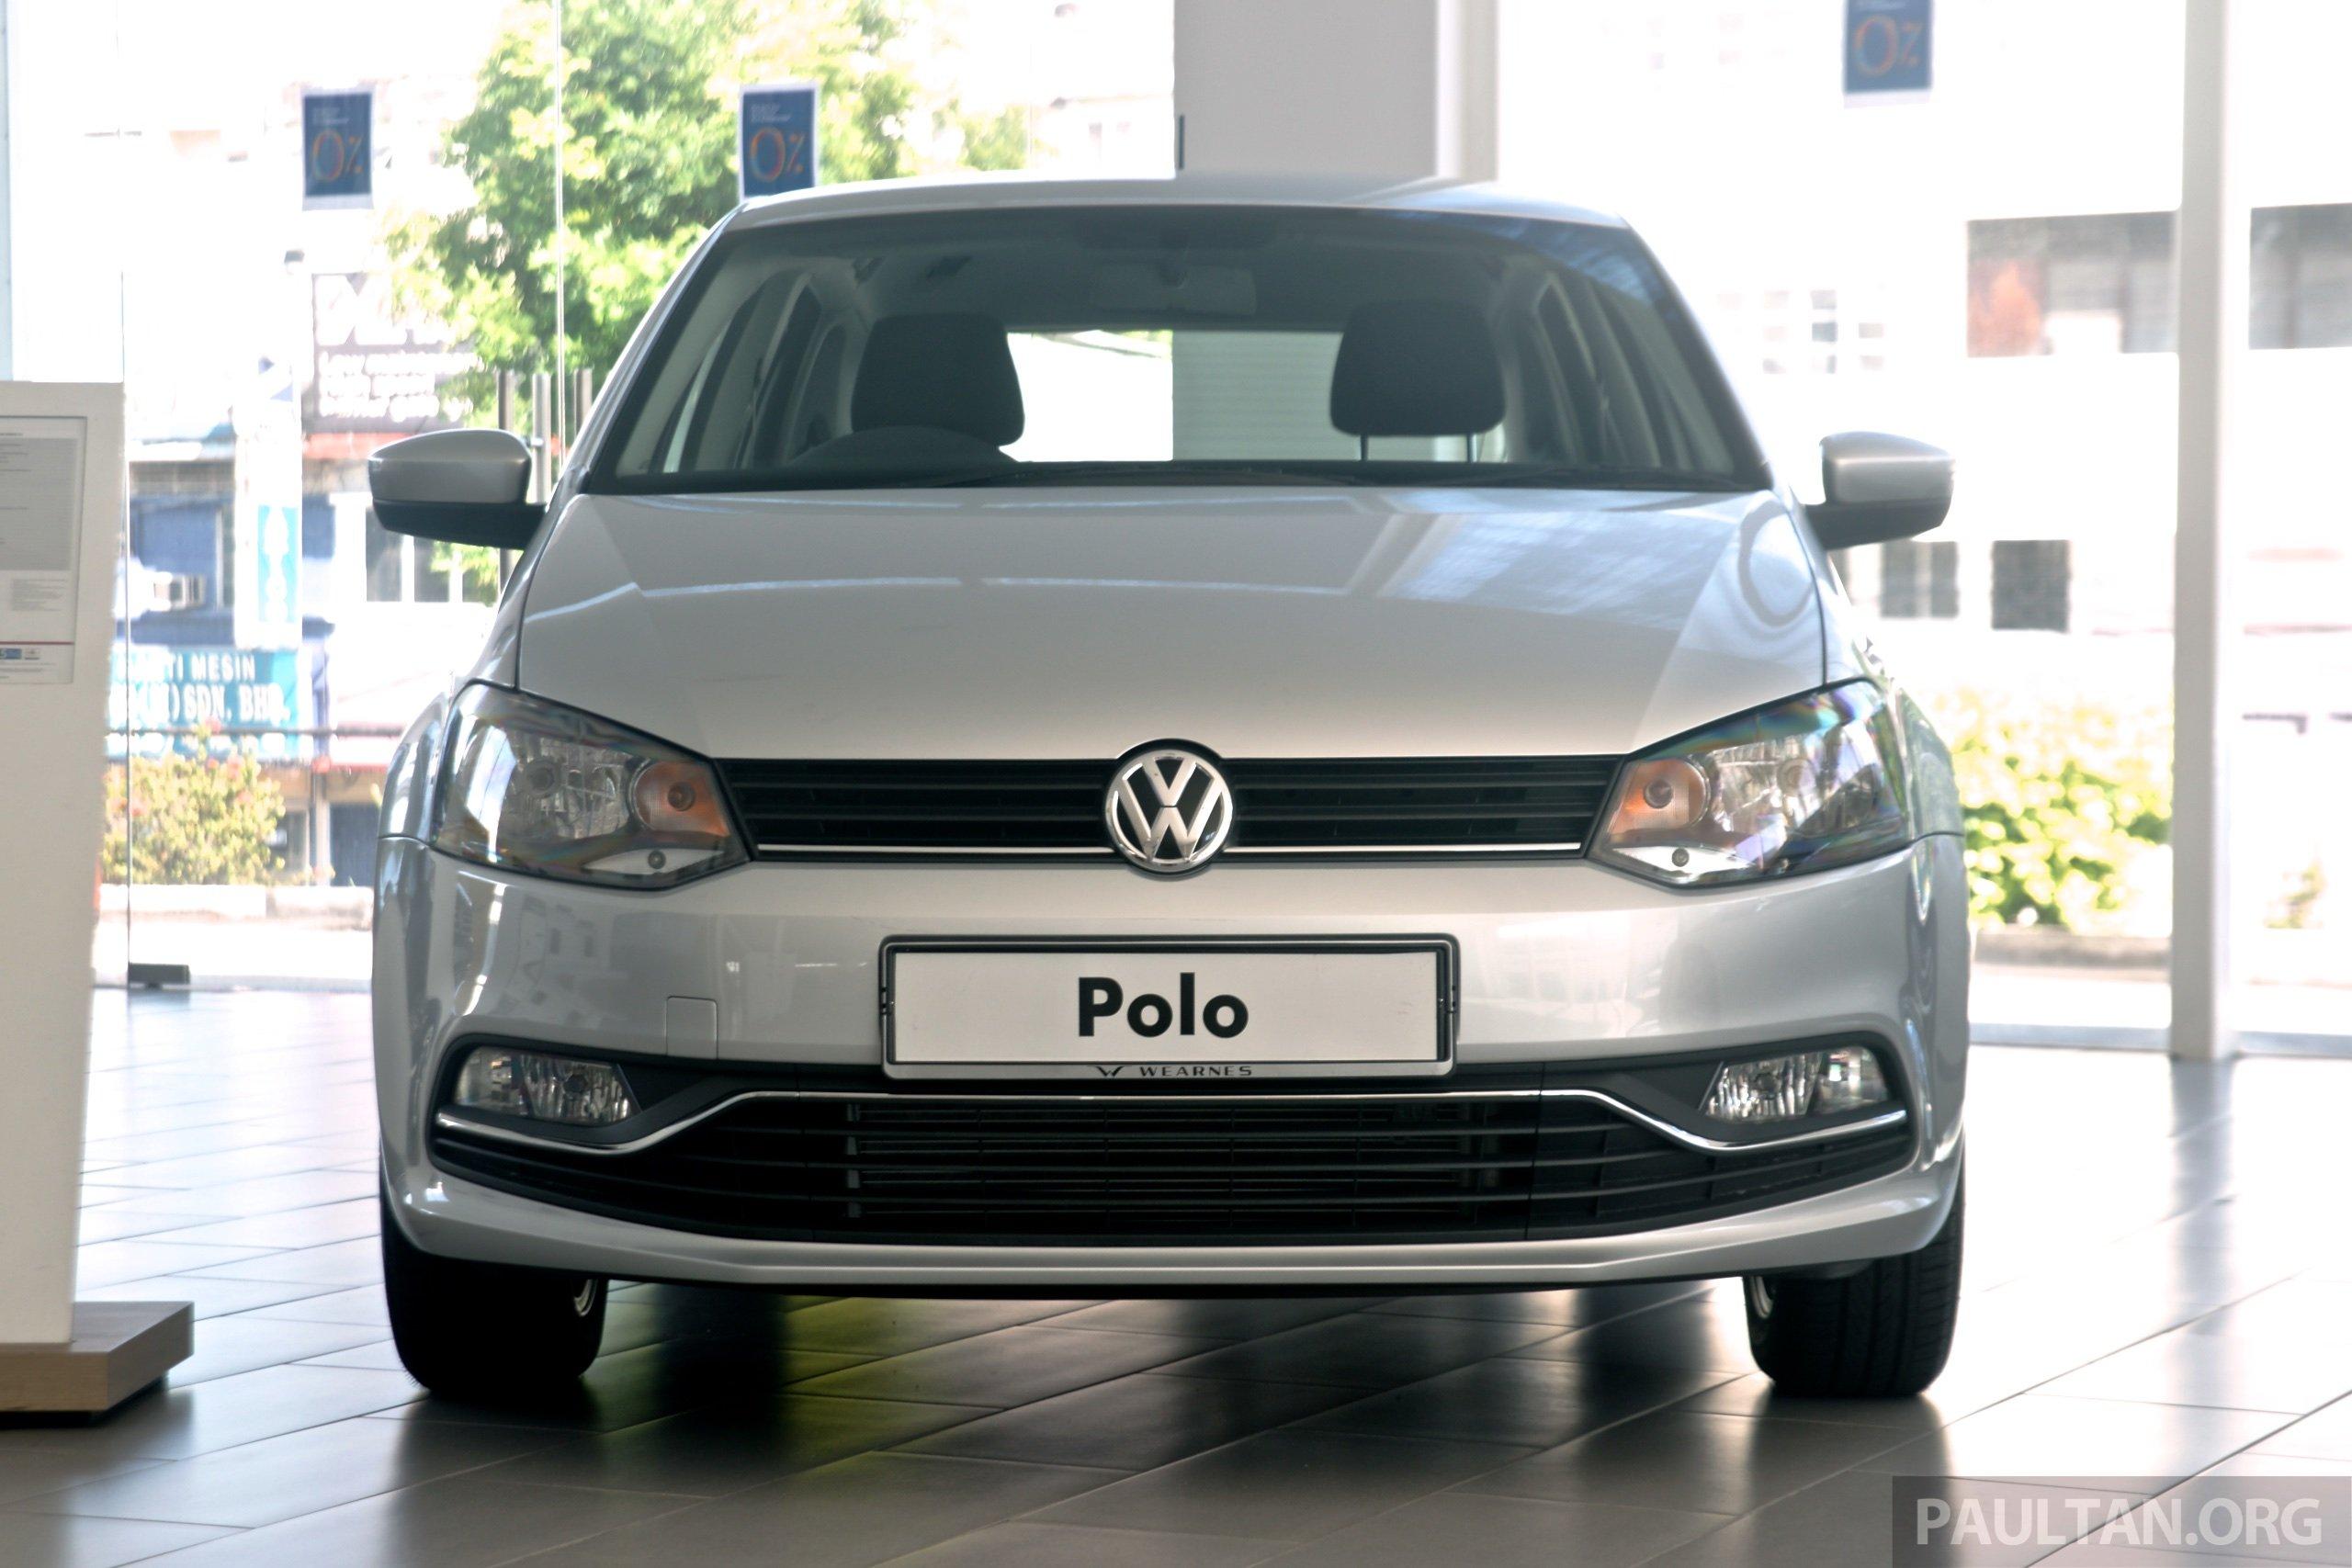 Polo 1.6 降价,如今只需RM76k就可成交! volkswagen-polo ... Volkswagen Polo